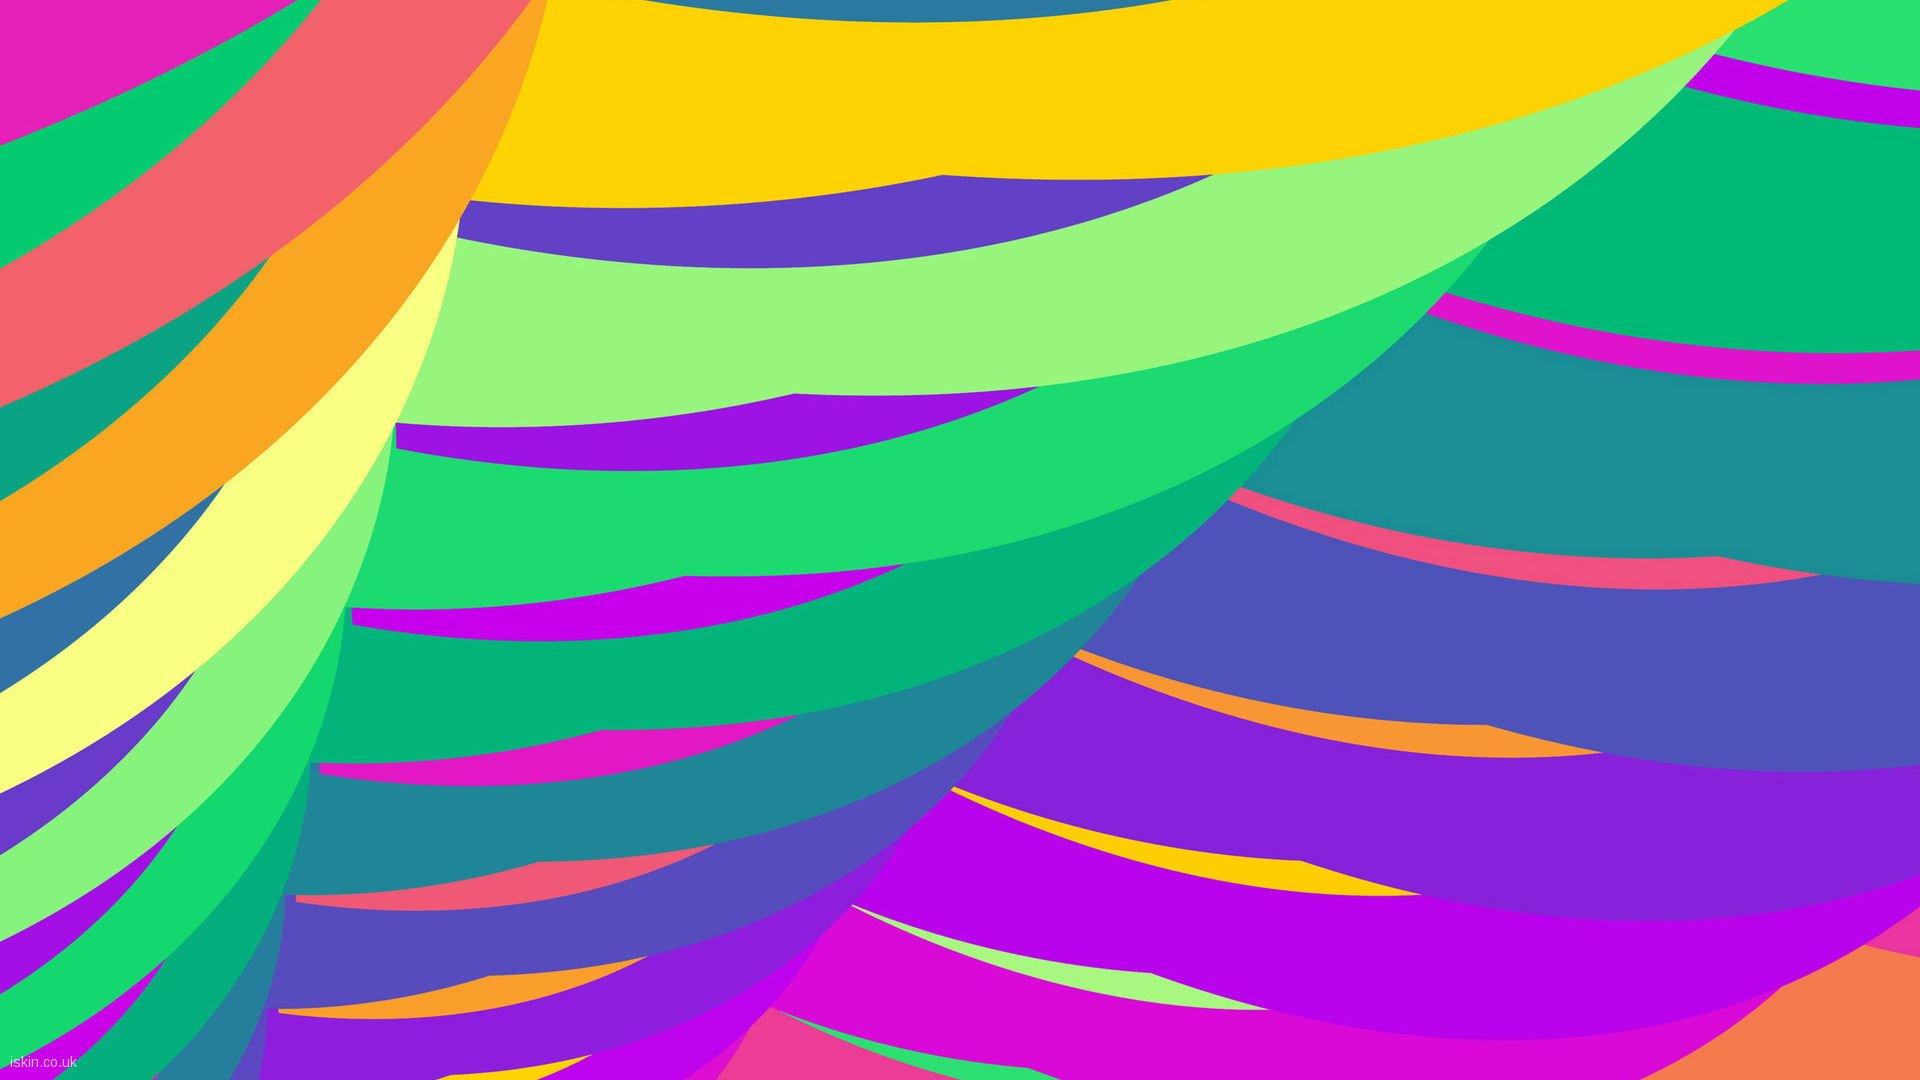 New Geometric Wallpaper Patterns Hd Cool Background Patterns